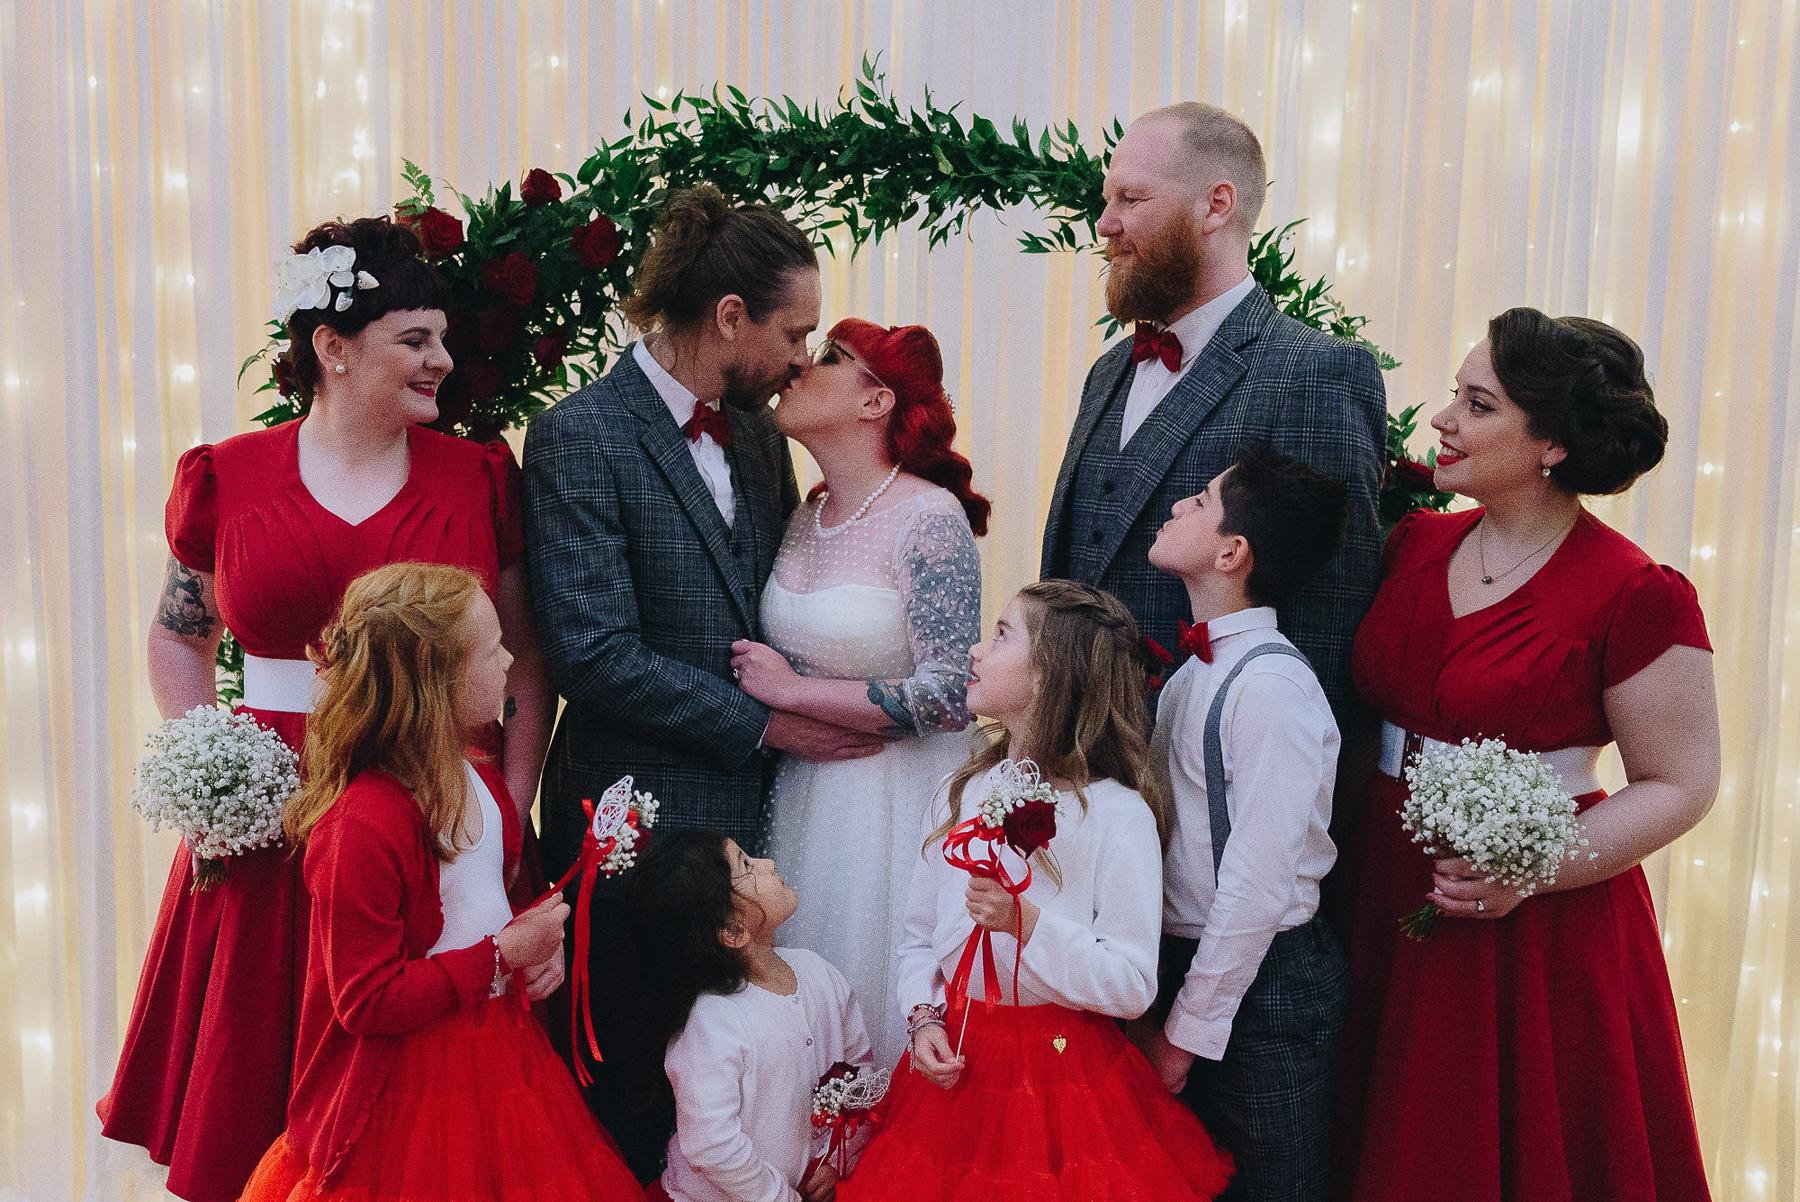 Wellbeing_Farm_Wedding_Photography_The_Pin-Up_Bride_Lara_Shaun-107.jpg